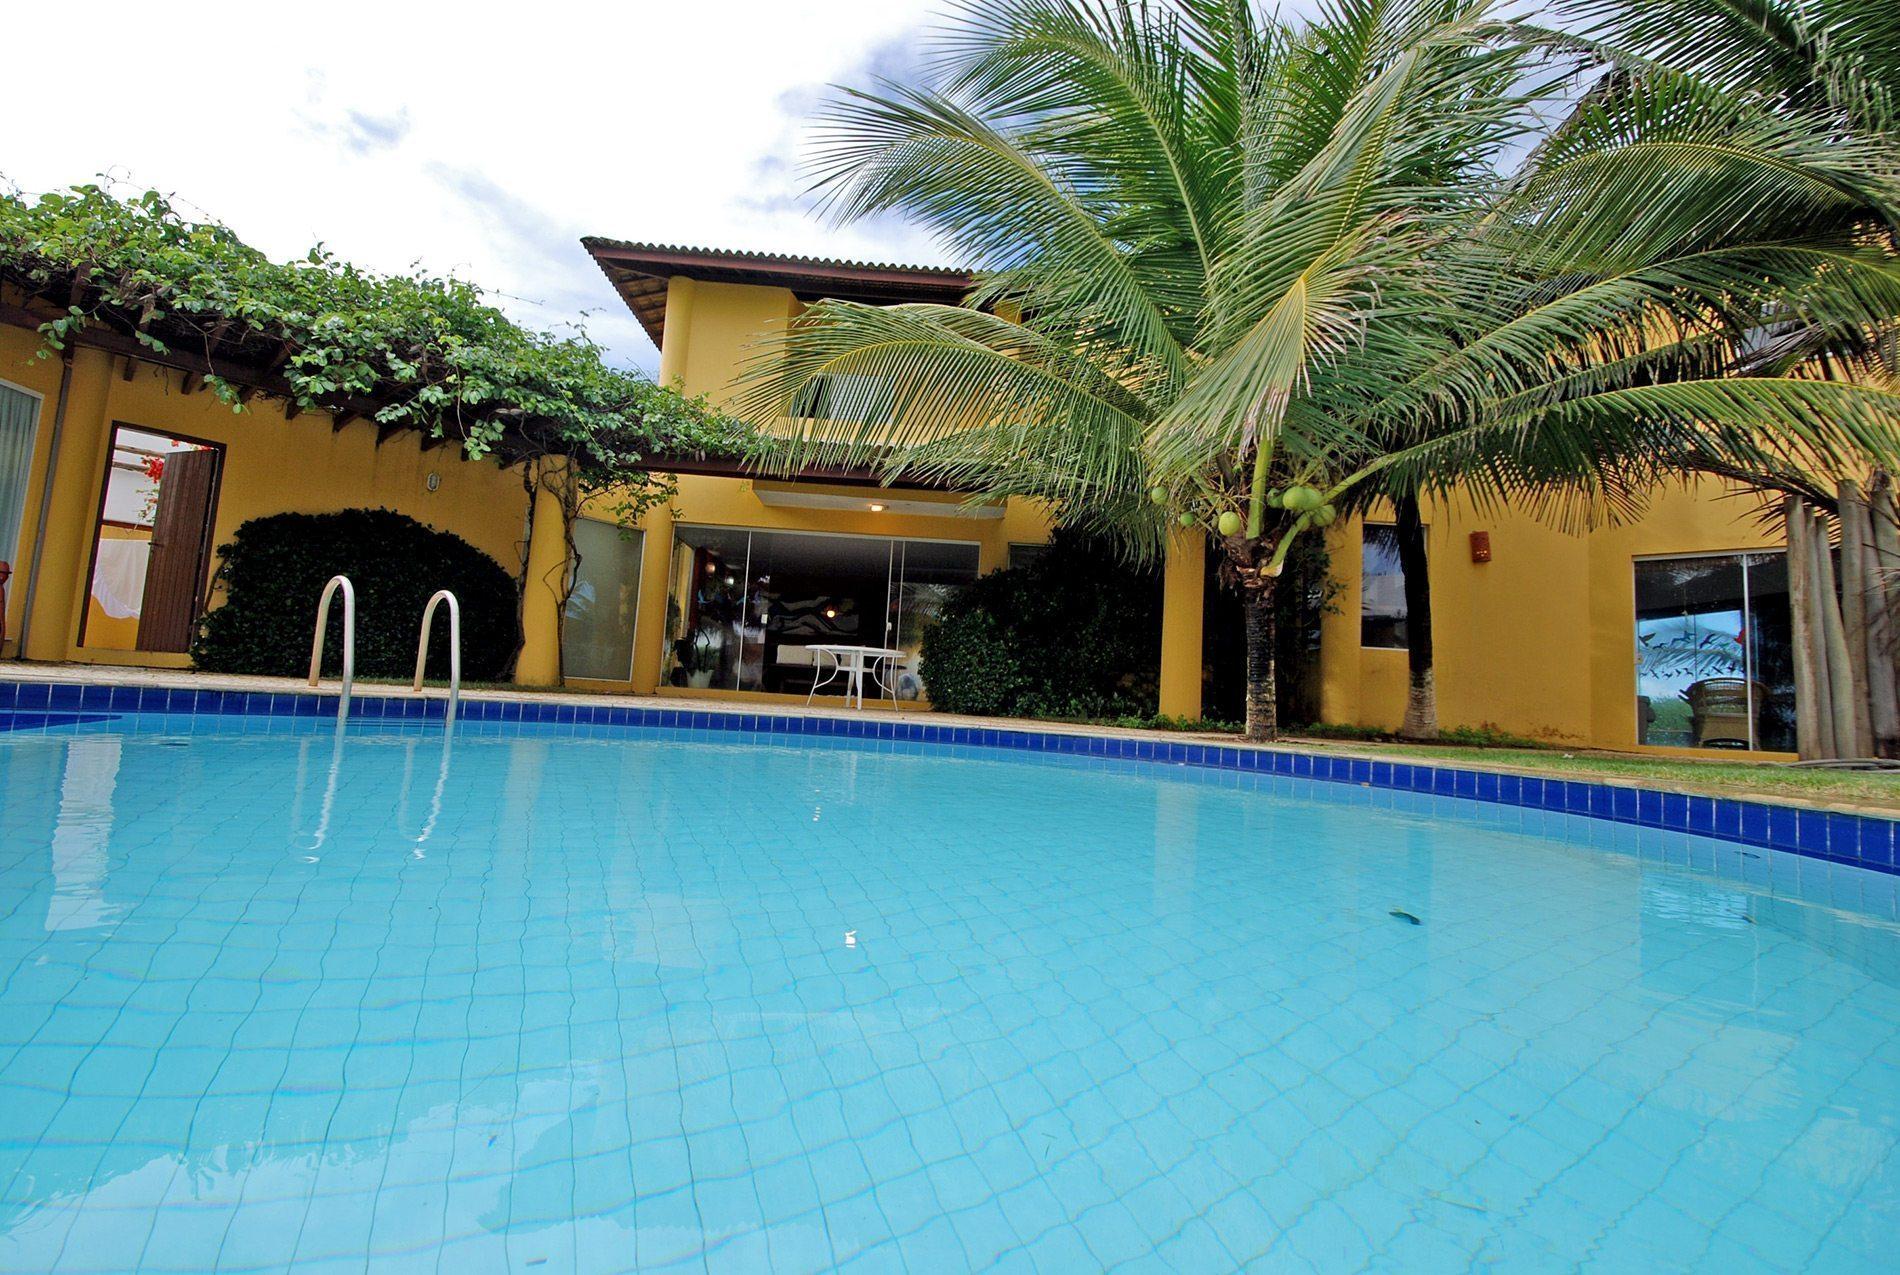 Interlagos beachfront home for sale in Praia dos Lagos